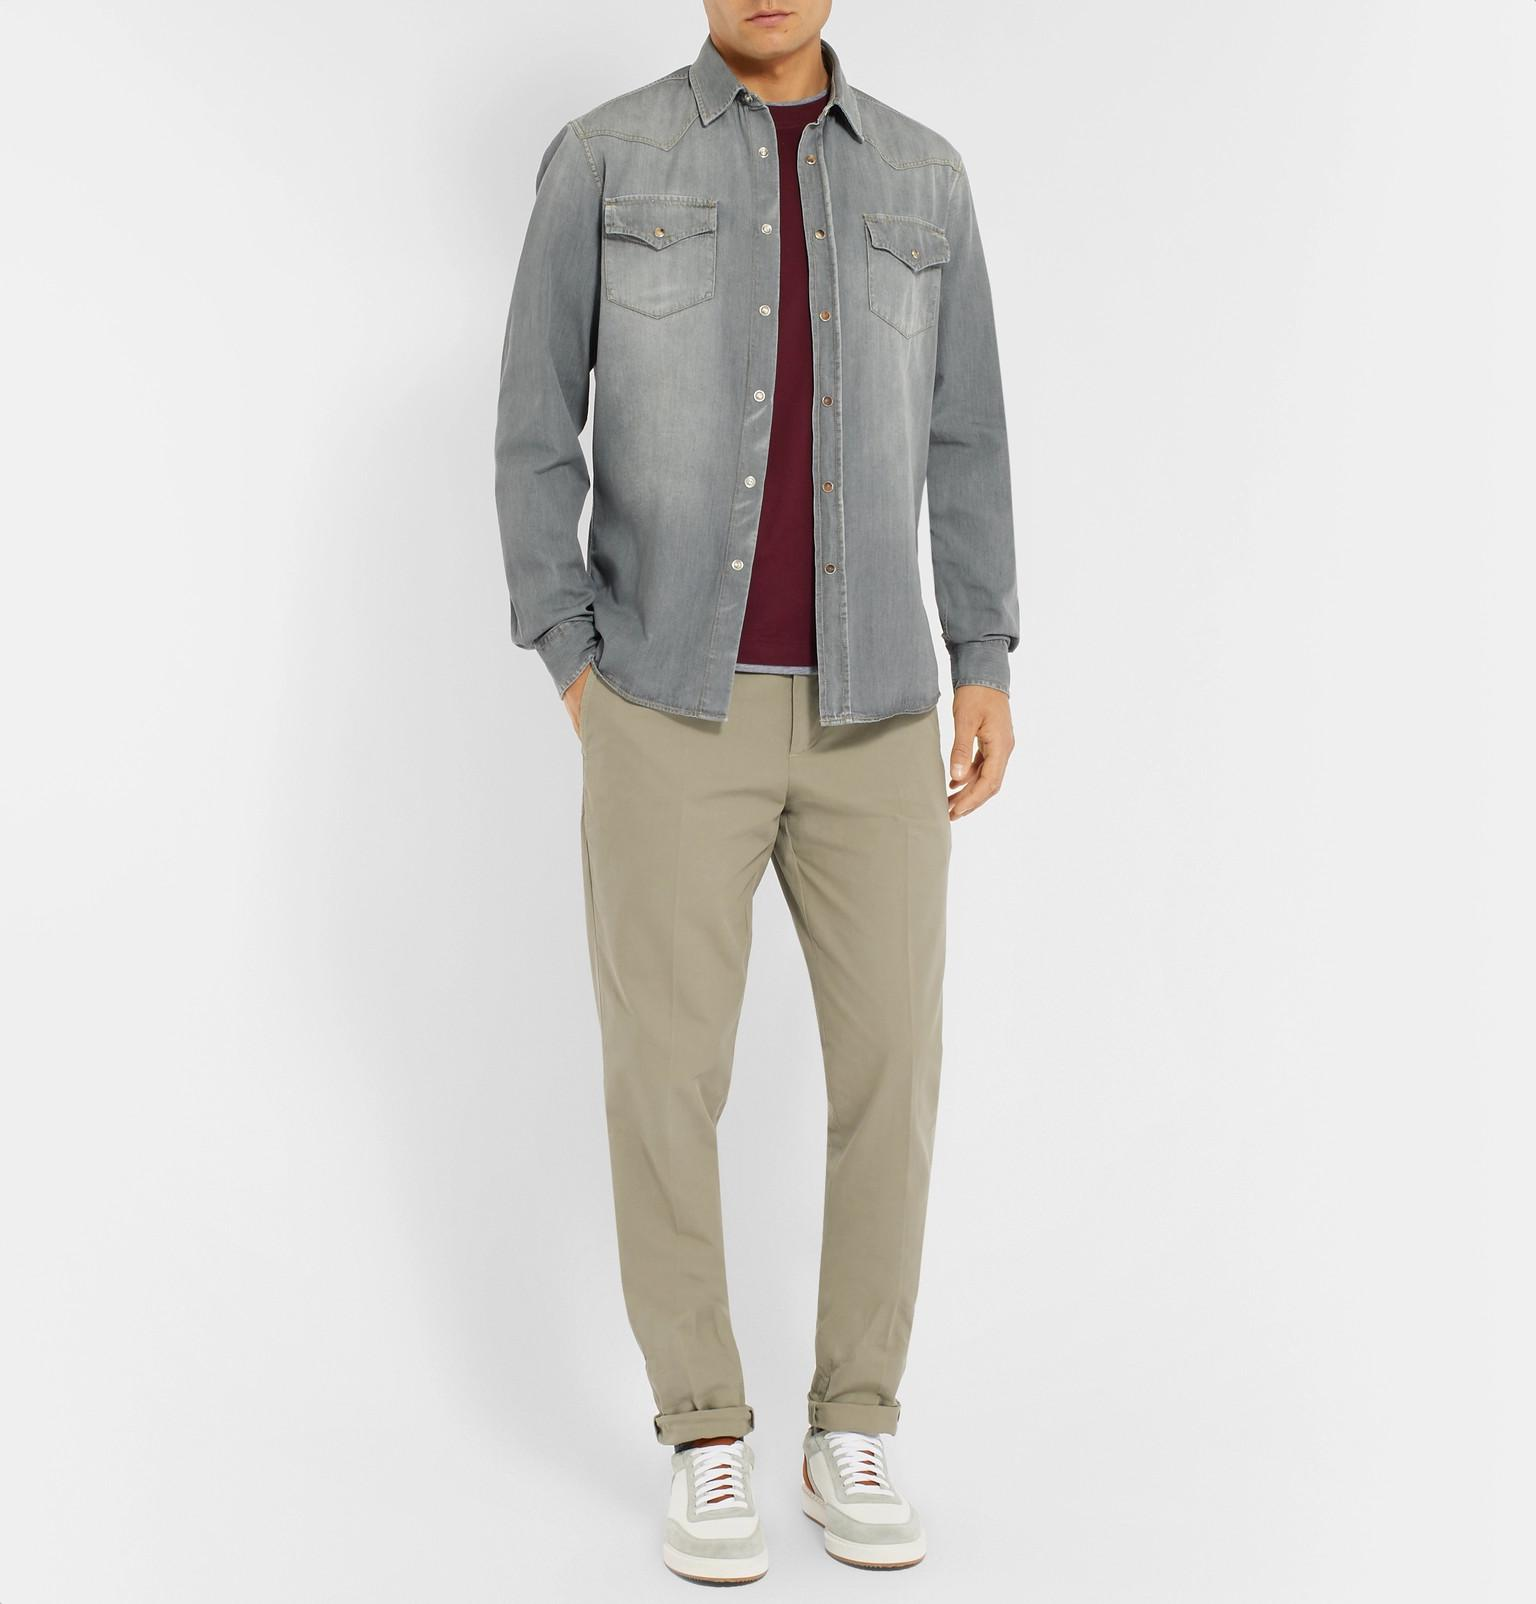 e4dd1db7e4 Brunello Cucinelli - Gray Slim-fit Washed-denim Western Shirt for Men -  Lyst. View fullscreen